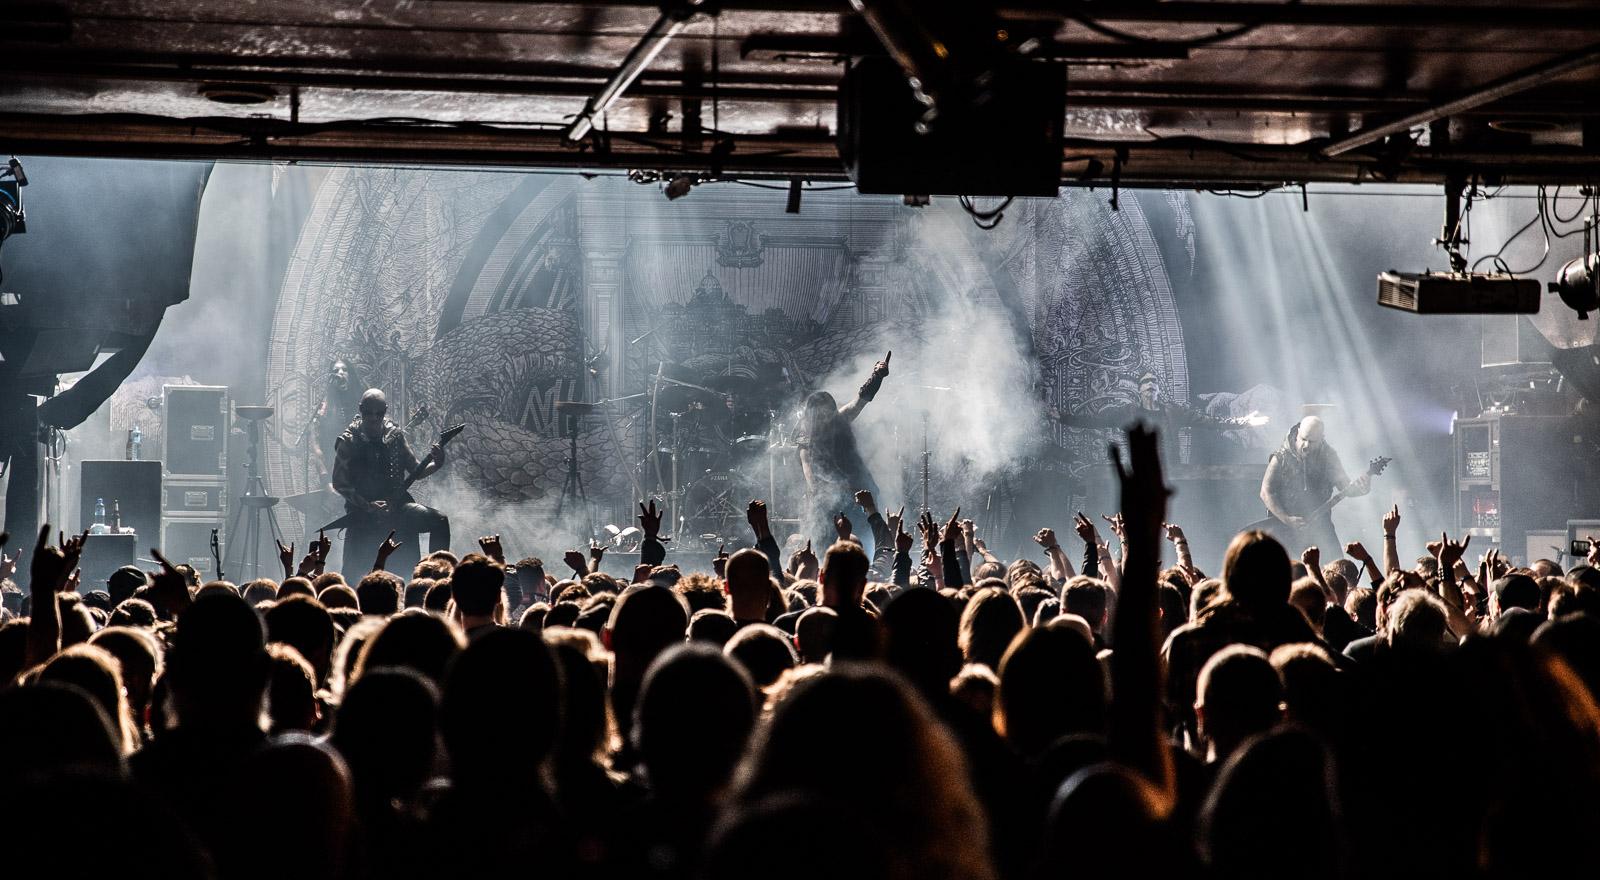 20190418-Dimmu_Borgir@Infernofestivalen_2019©WillyLarsenPhotography_Disharmoni (49 of 79)